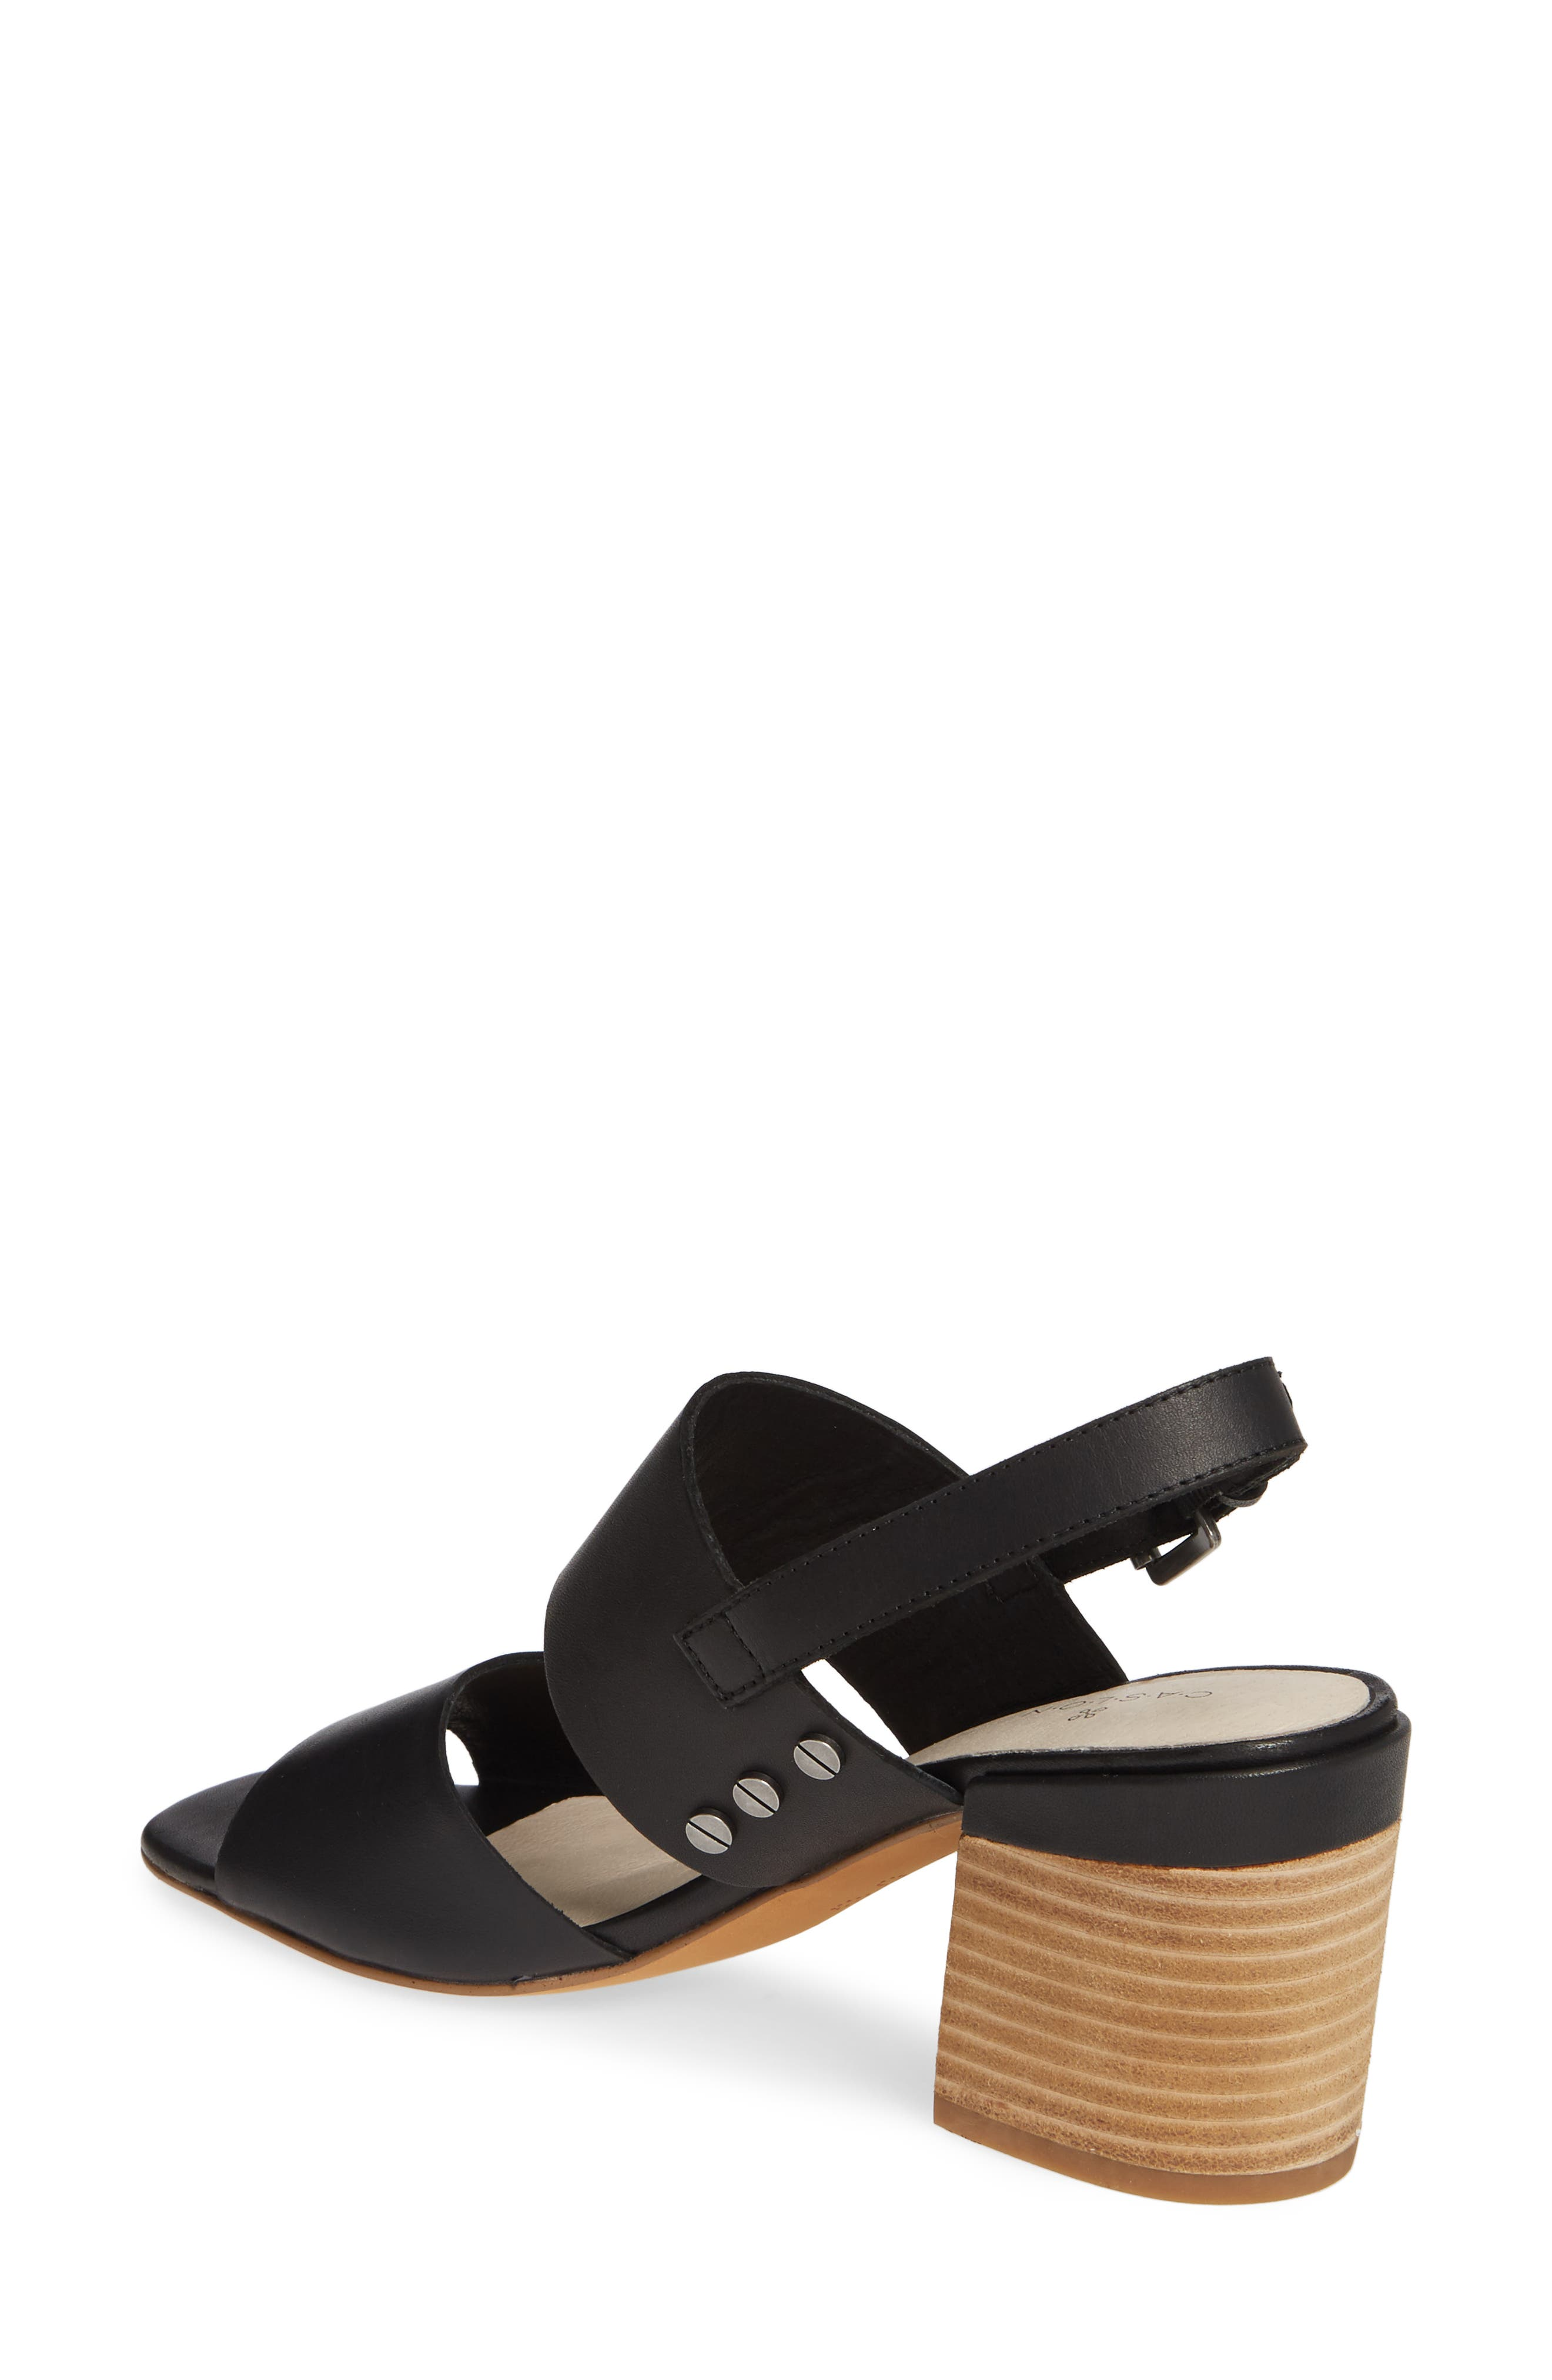 CASLON<SUP>®</SUP>, Caslon Brayden Slingback Sandal, Alternate thumbnail 2, color, BLACK LEATHER